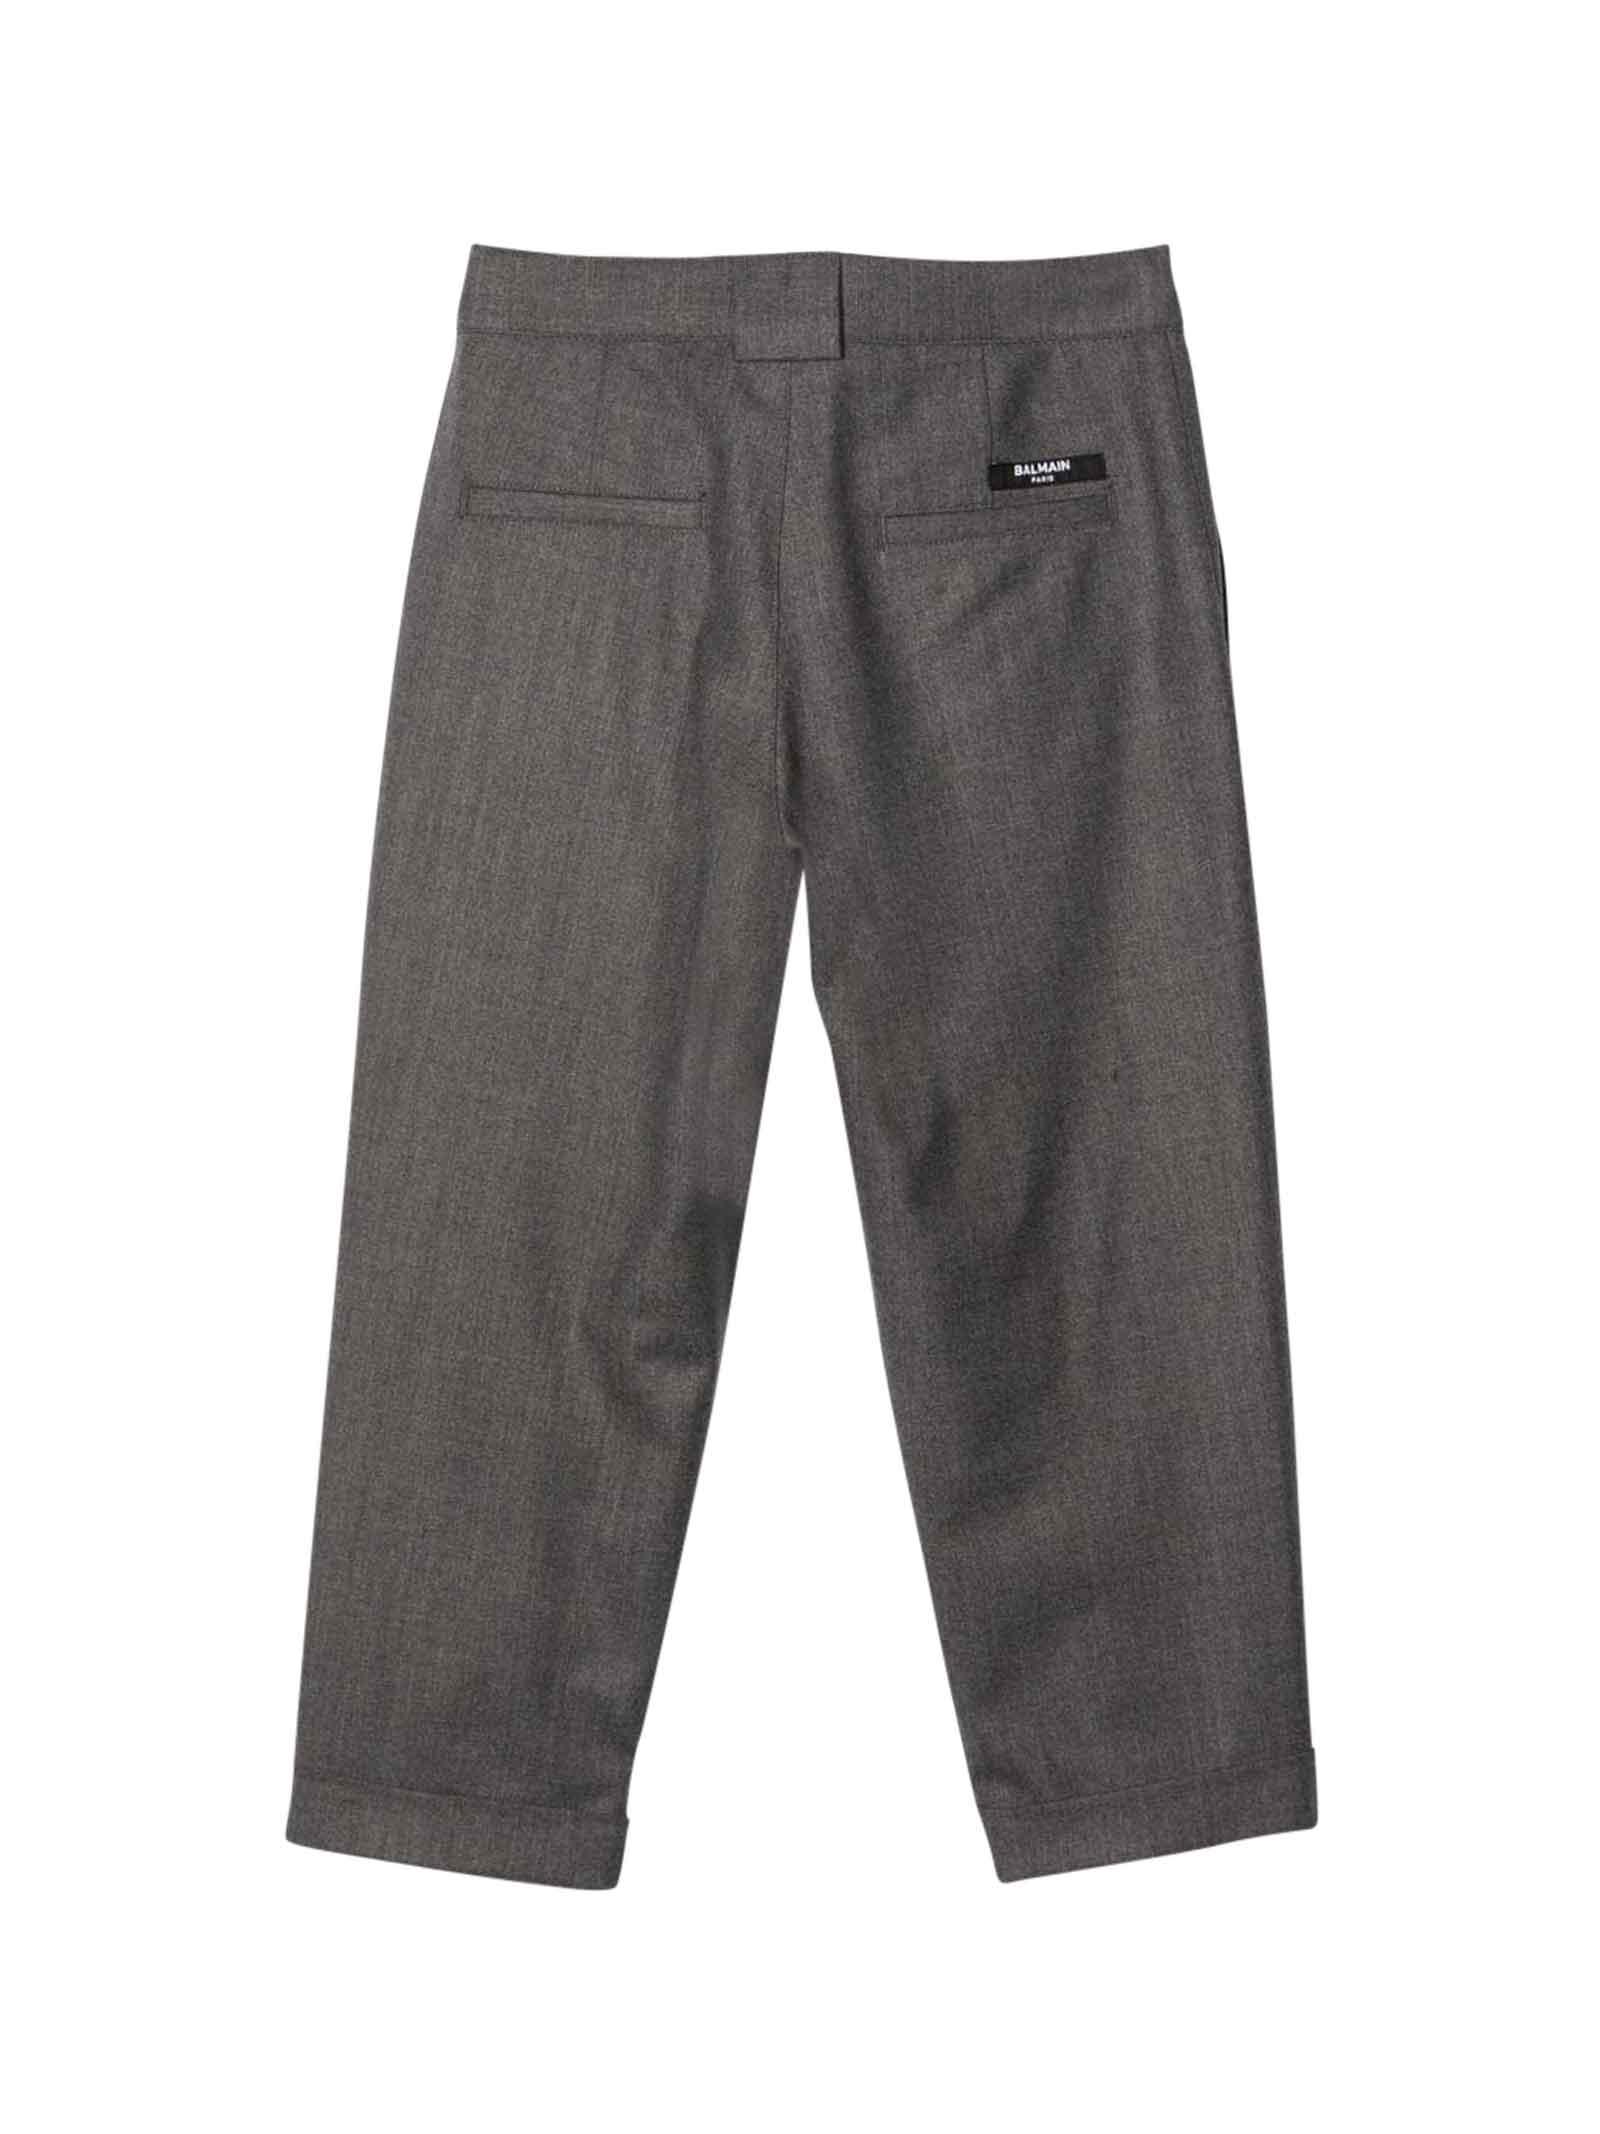 Pantalone grigio unisex BALMAIN KIDS | 9 | 6P6550I0008912